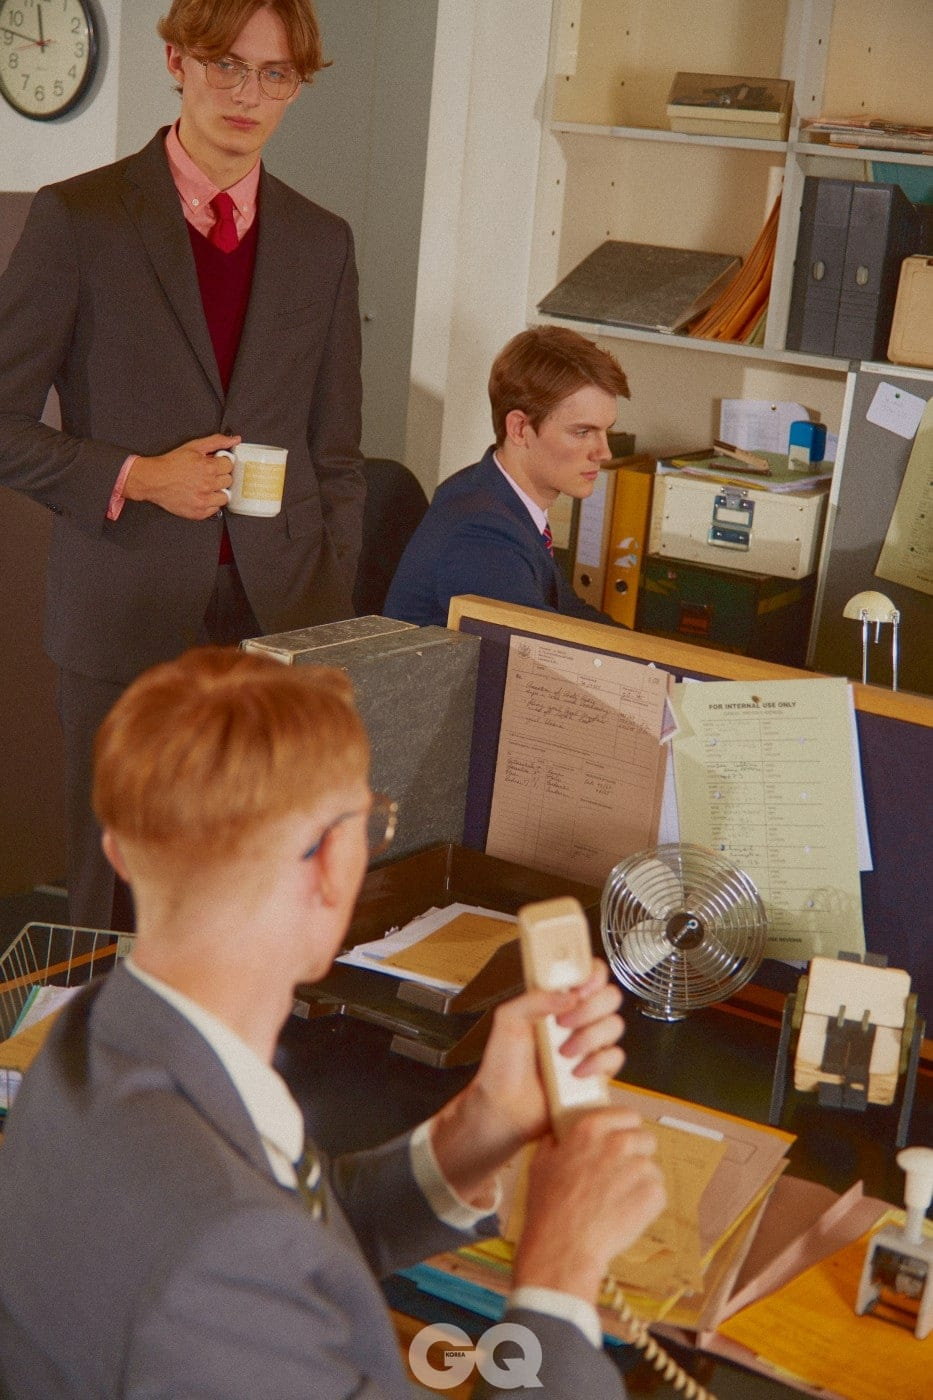 Left 왼쪽 위부터 | 브랑누 수트, 핑크색 니트와 셔츠, 레드 타이, 모두 마시모 두띠. 금테 안경, 올리버 피플스 × 더 로우. 남색 수트, 마시모 두띠. 핑크 셔츠, H&M. 줄무늬 타이, 브룩스 브라더스. 회색 수트, 마시모 두띠. 화이트 셔츠, H&M. 줄무늬 타이, 닥스. 금테 안경, 프라다 at 데이비드 클루로우.